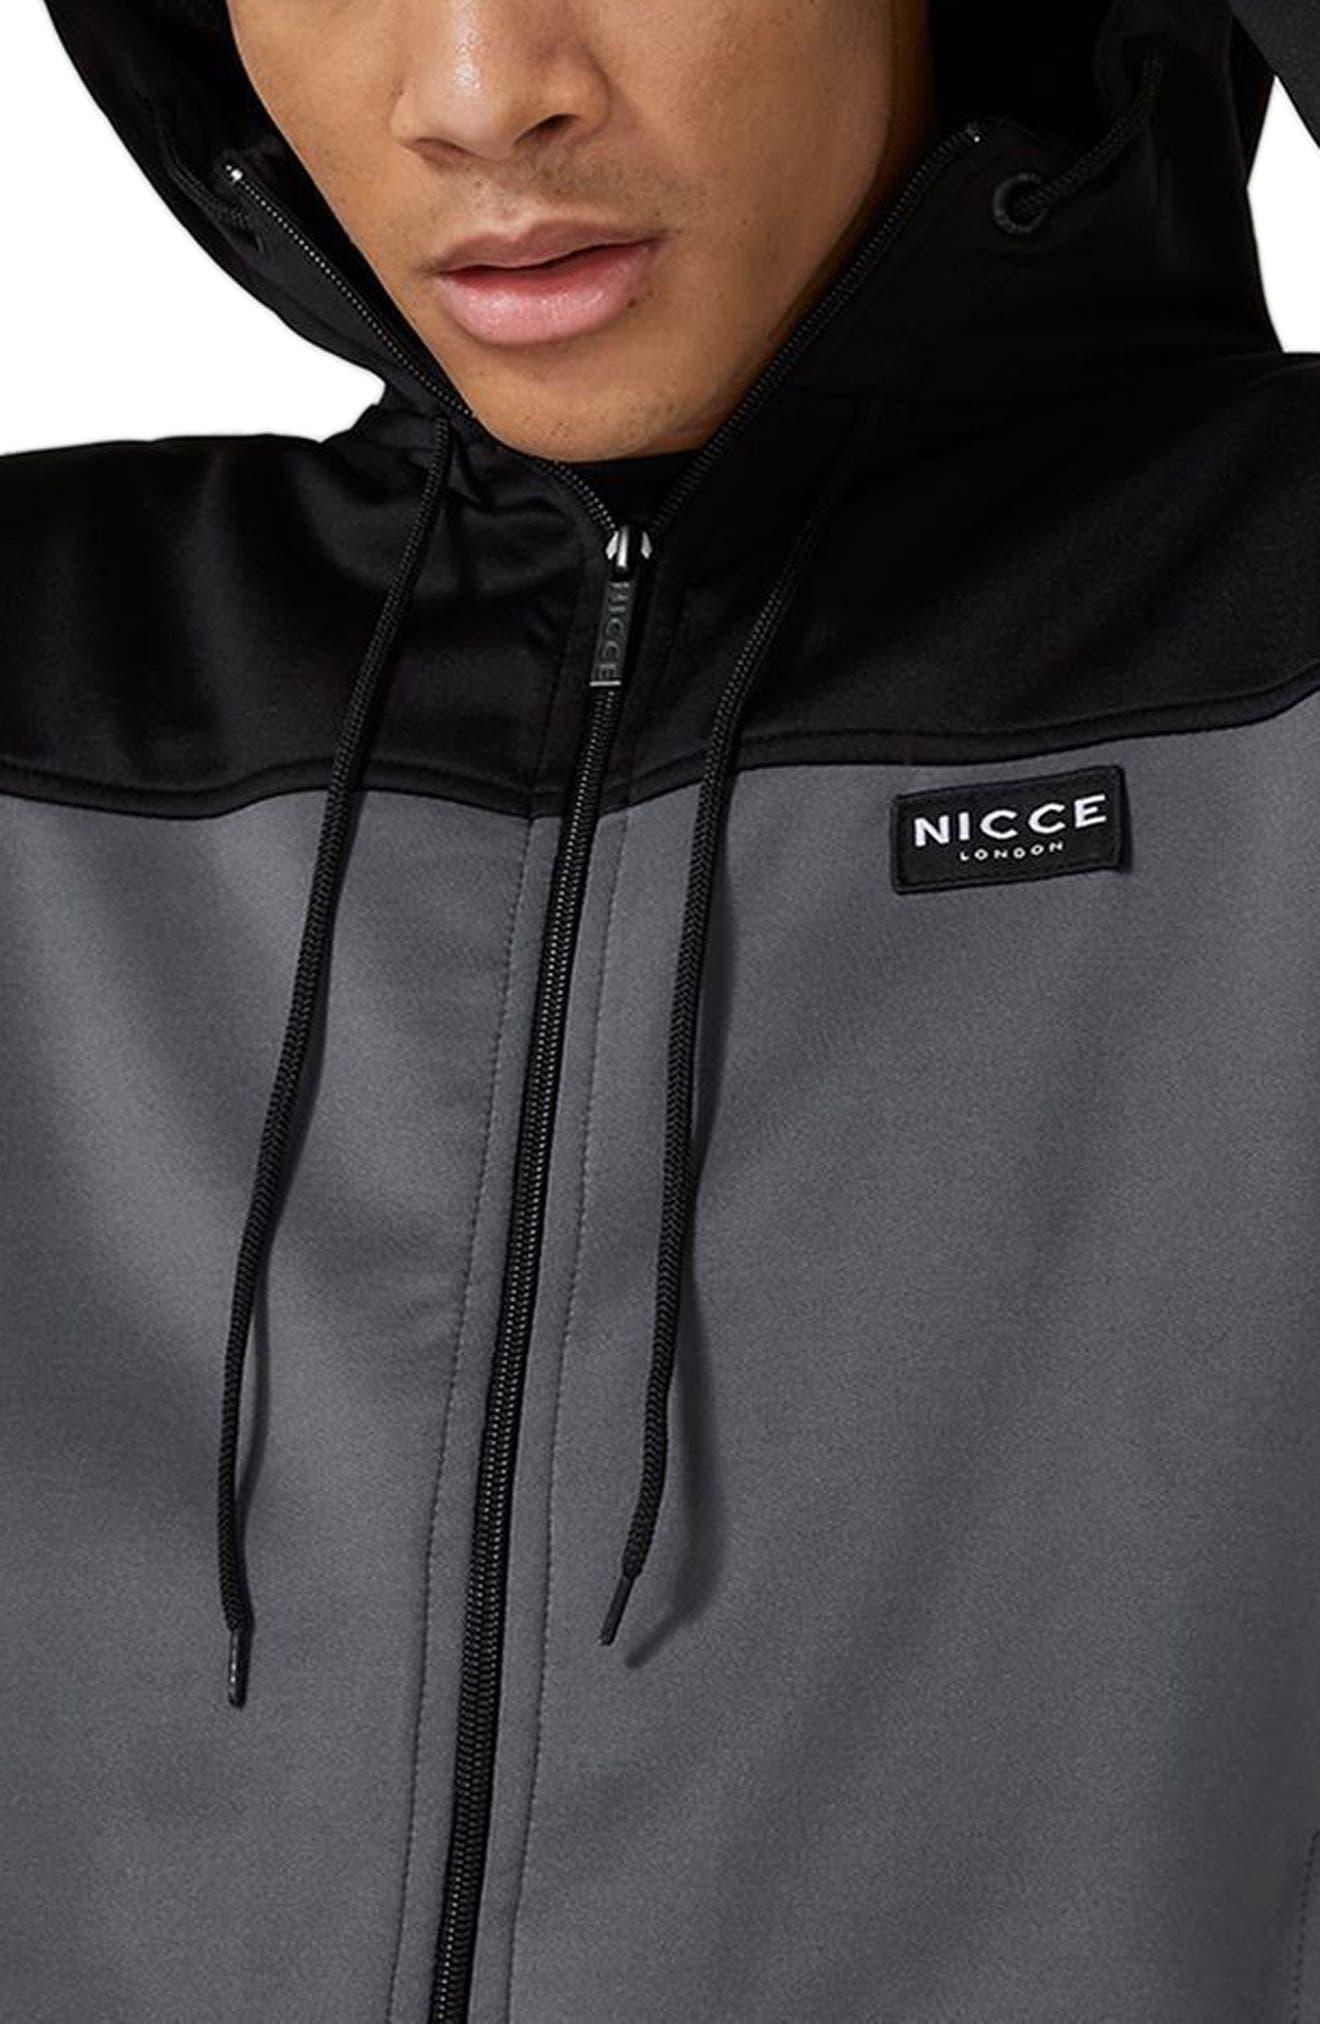 Topshop NICCE Hybrid Track Jacket,                             Alternate thumbnail 3, color,                             001